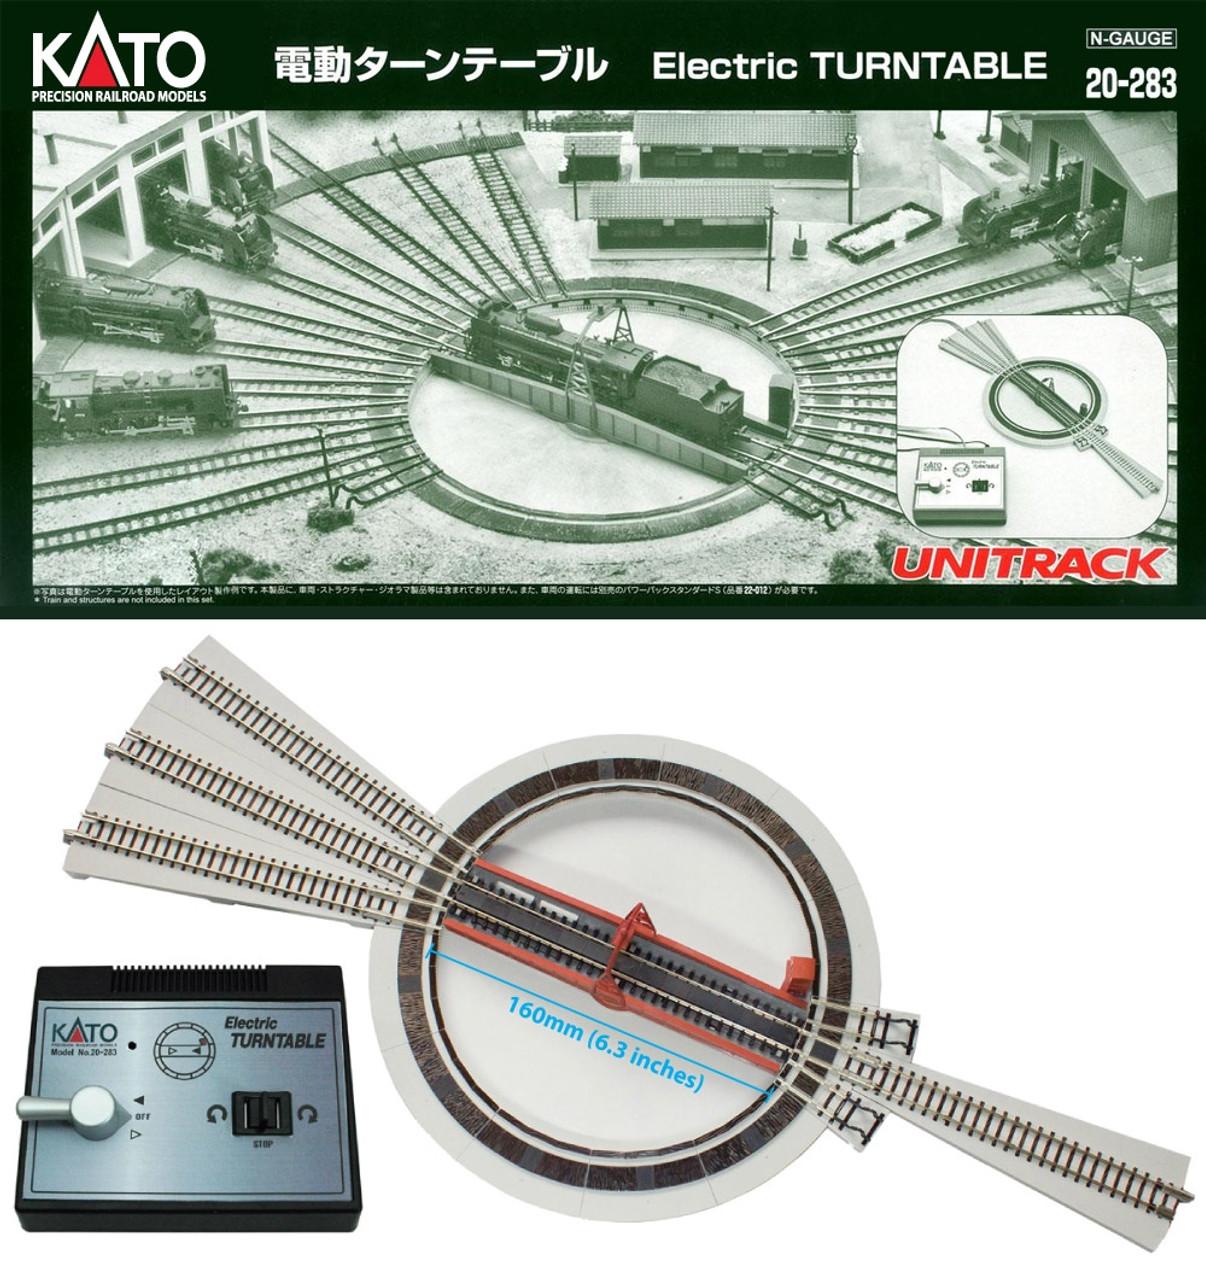 hight resolution of kato n 20 283 motorized turntable dcc friendly modeltrainstuff comkato n 20283 motorized turntable